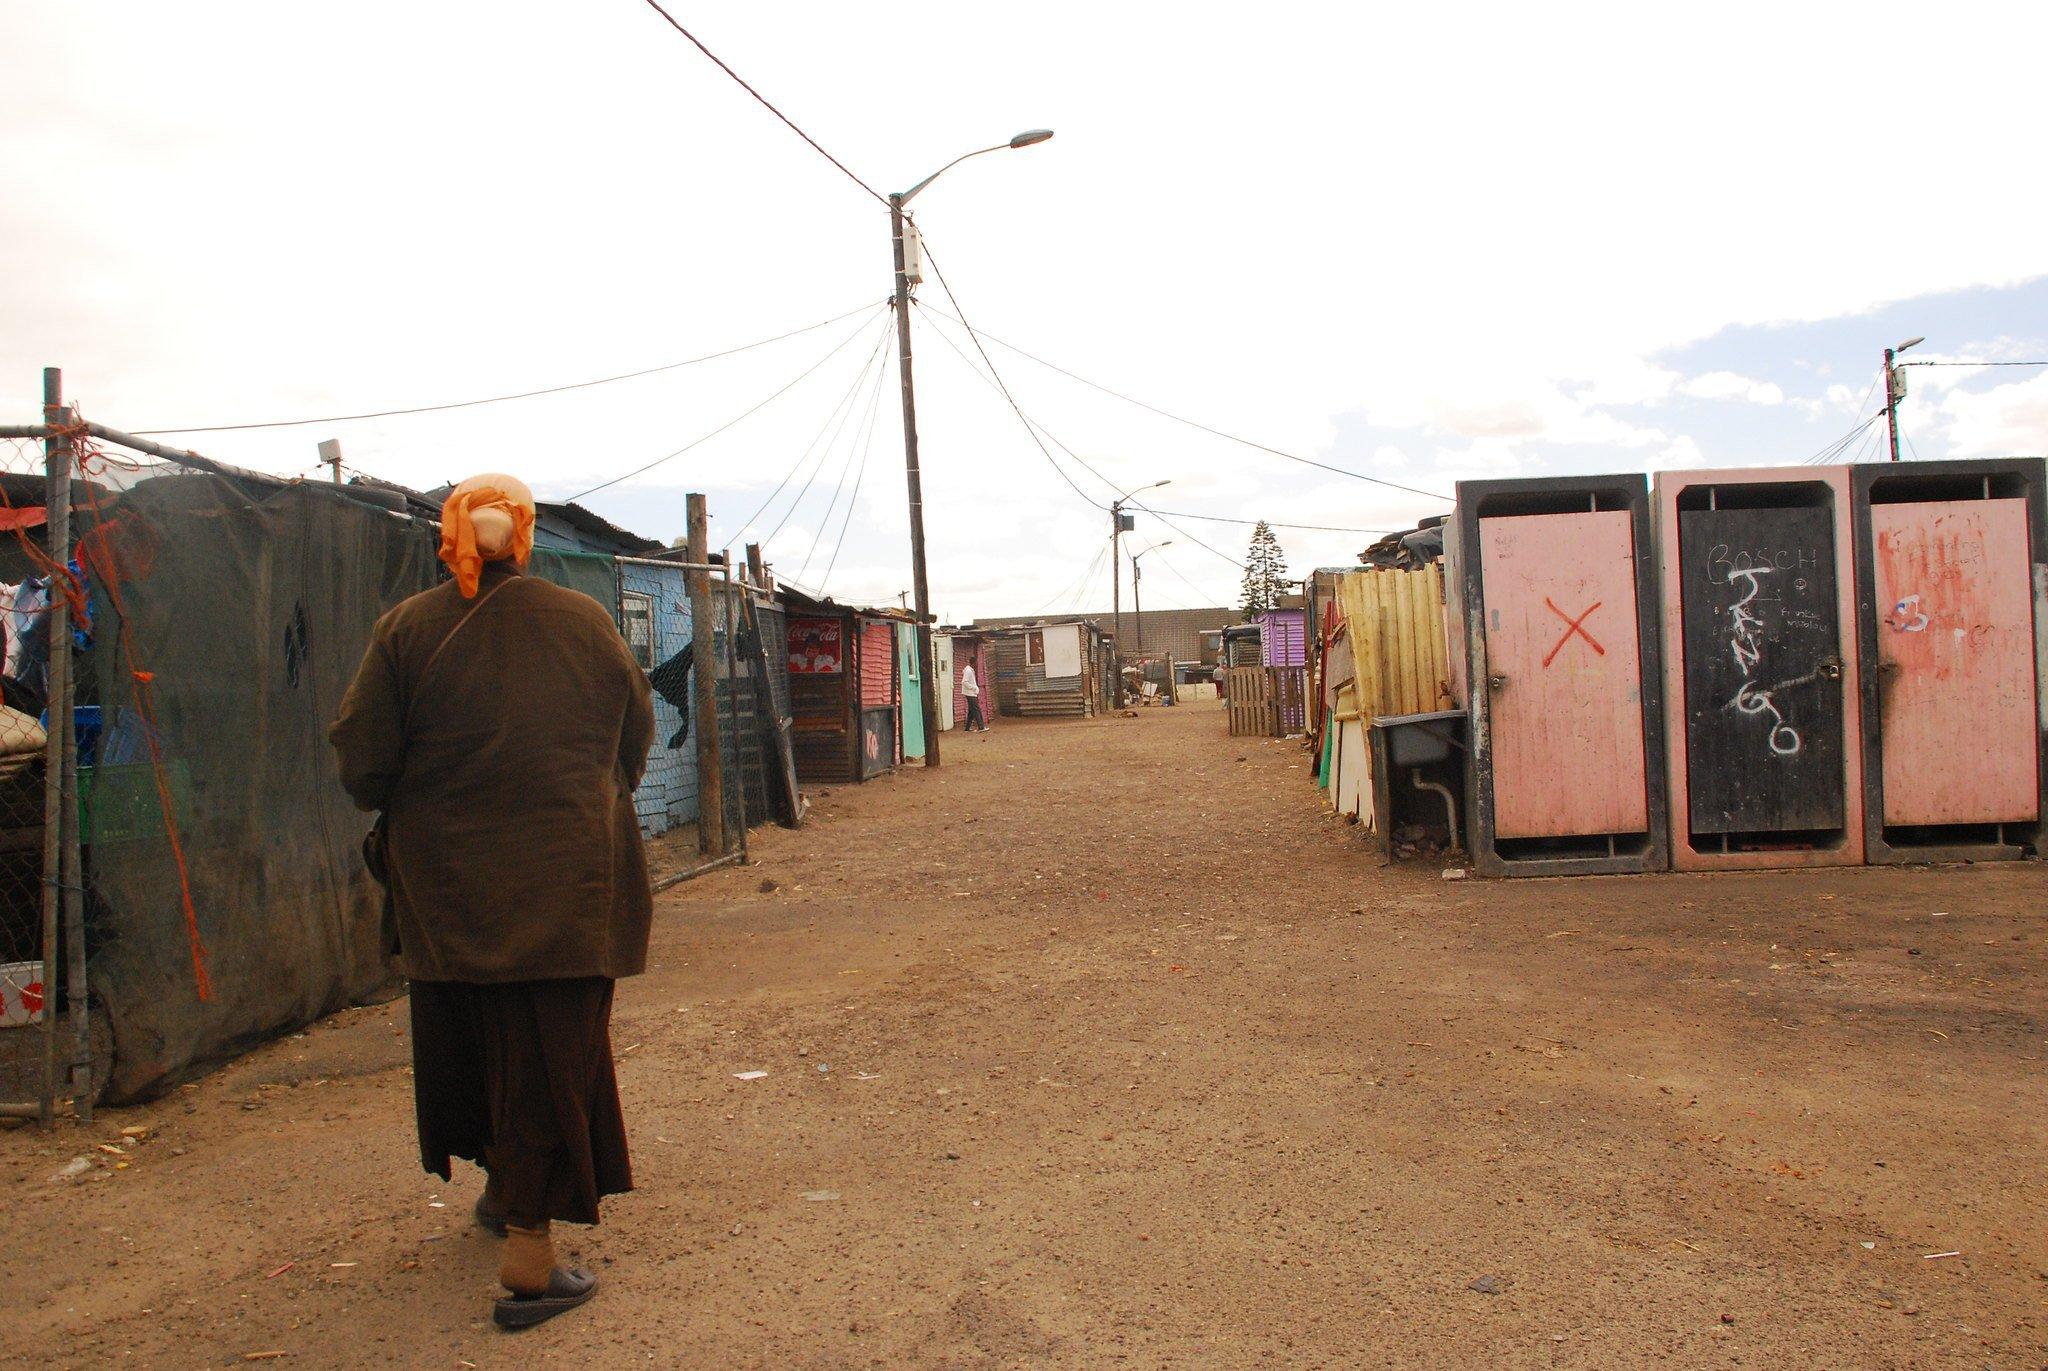 südafrika-straße-carissa-cupido.jpg